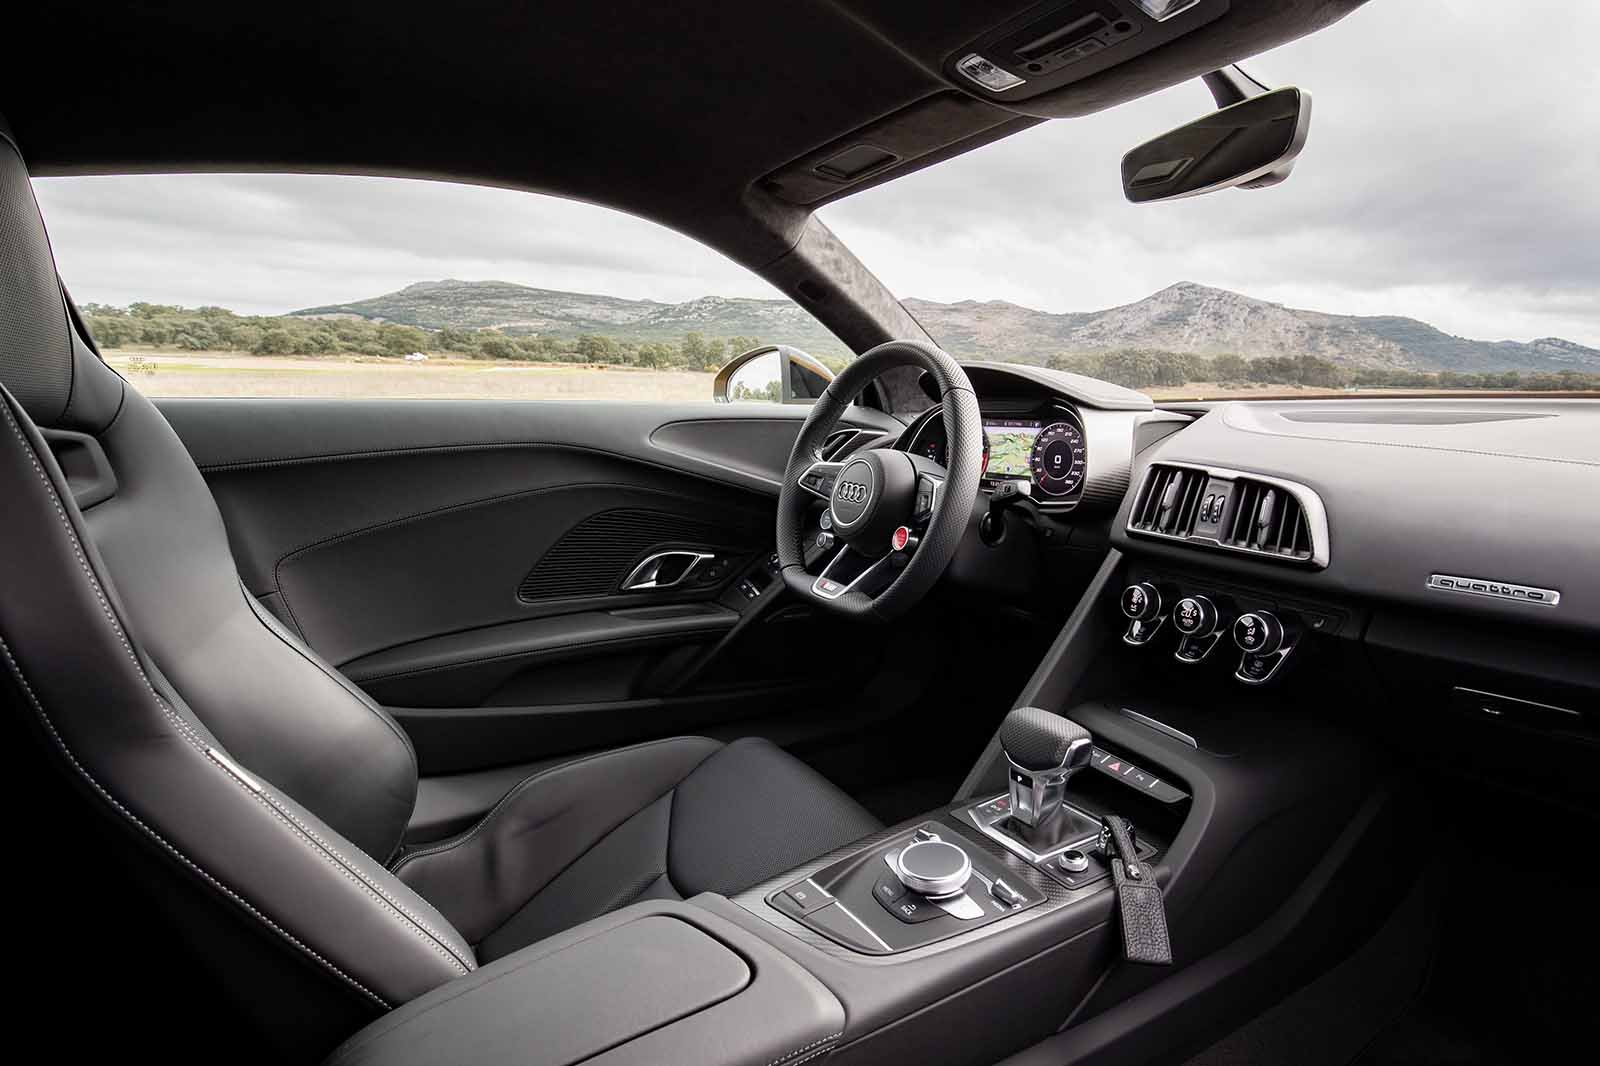 Audi R8 interior driving position